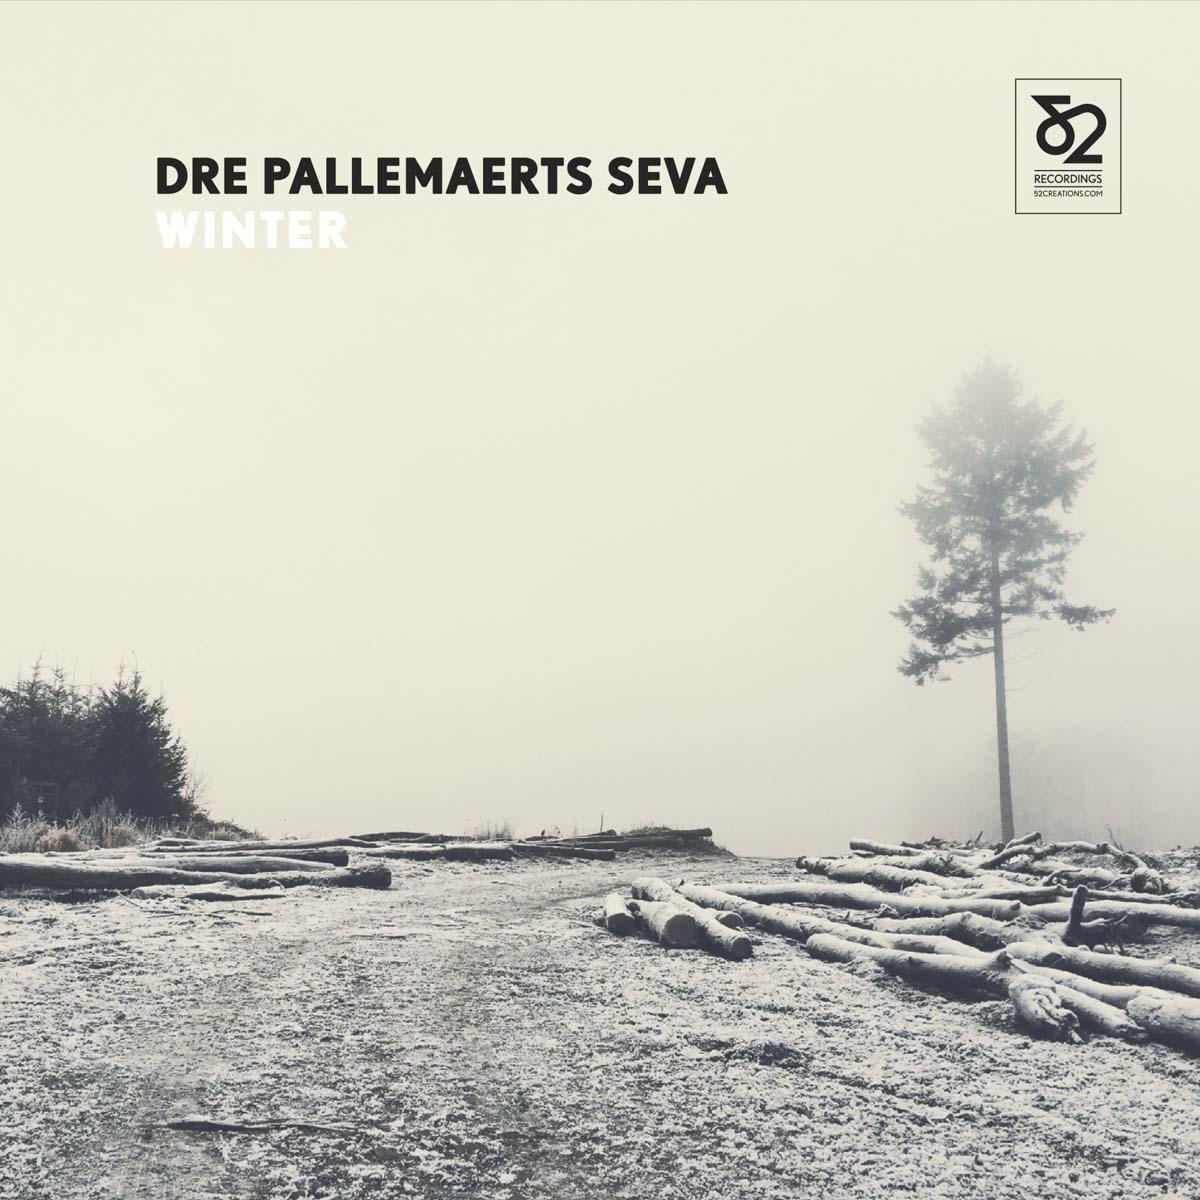 Dré Pallemaerts Seva - Winter